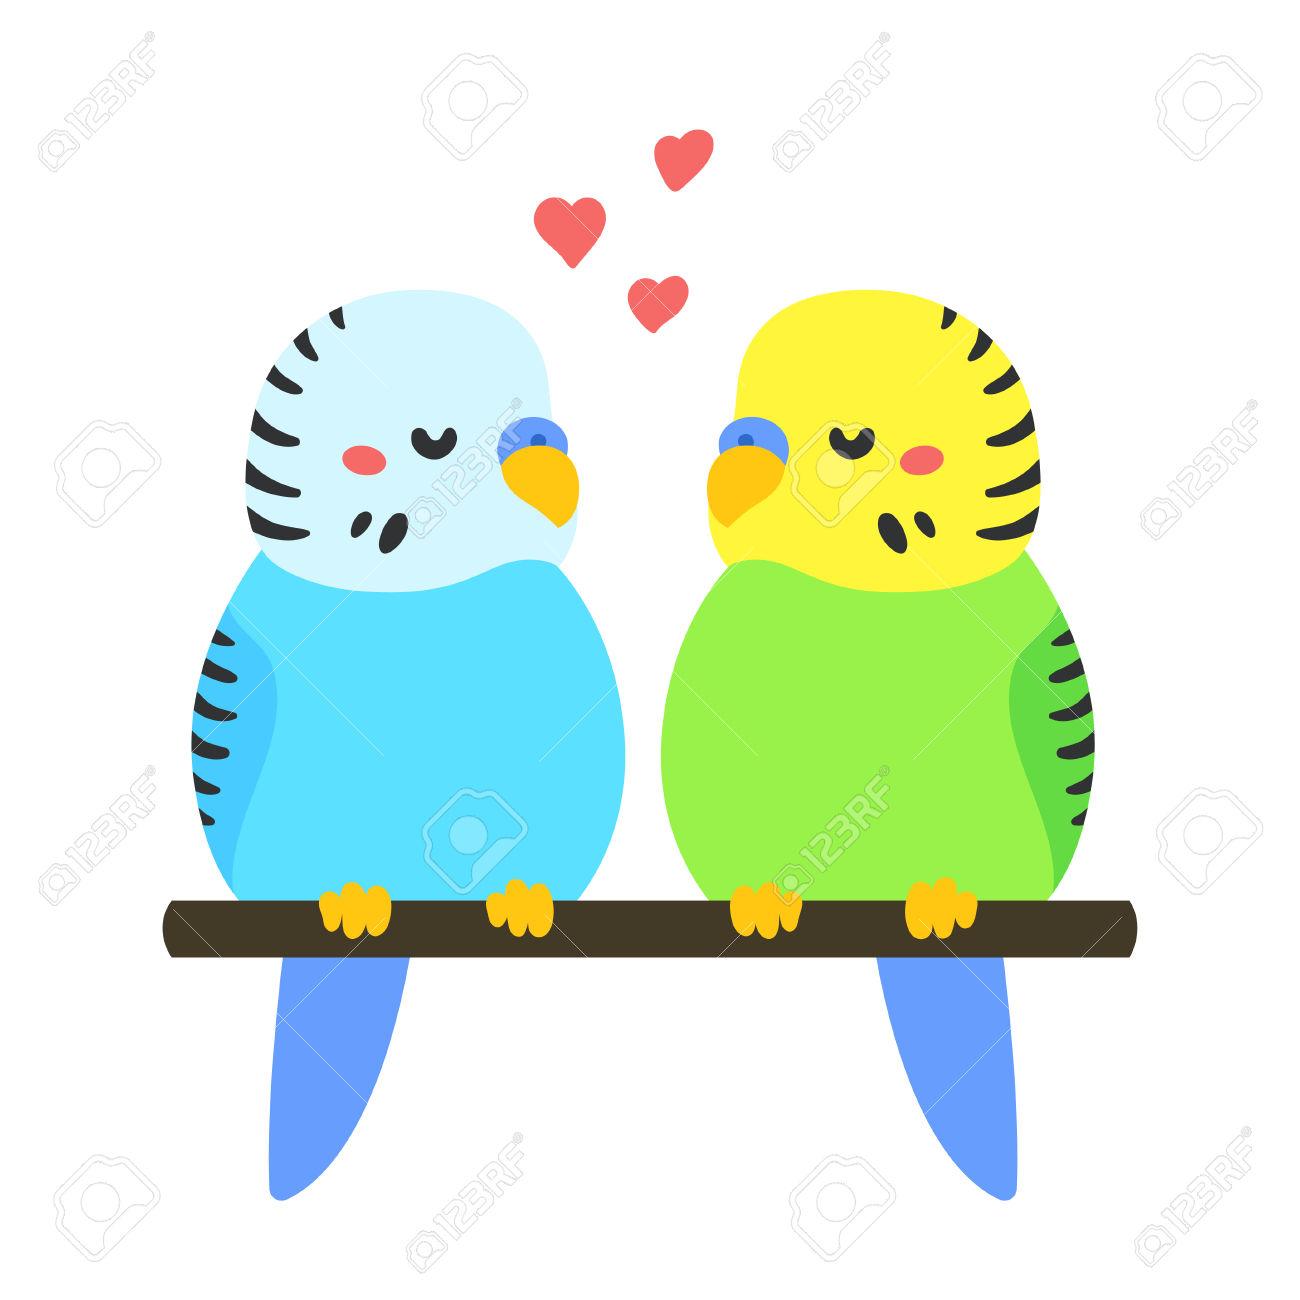 Parakeet clipart #5, Download drawings